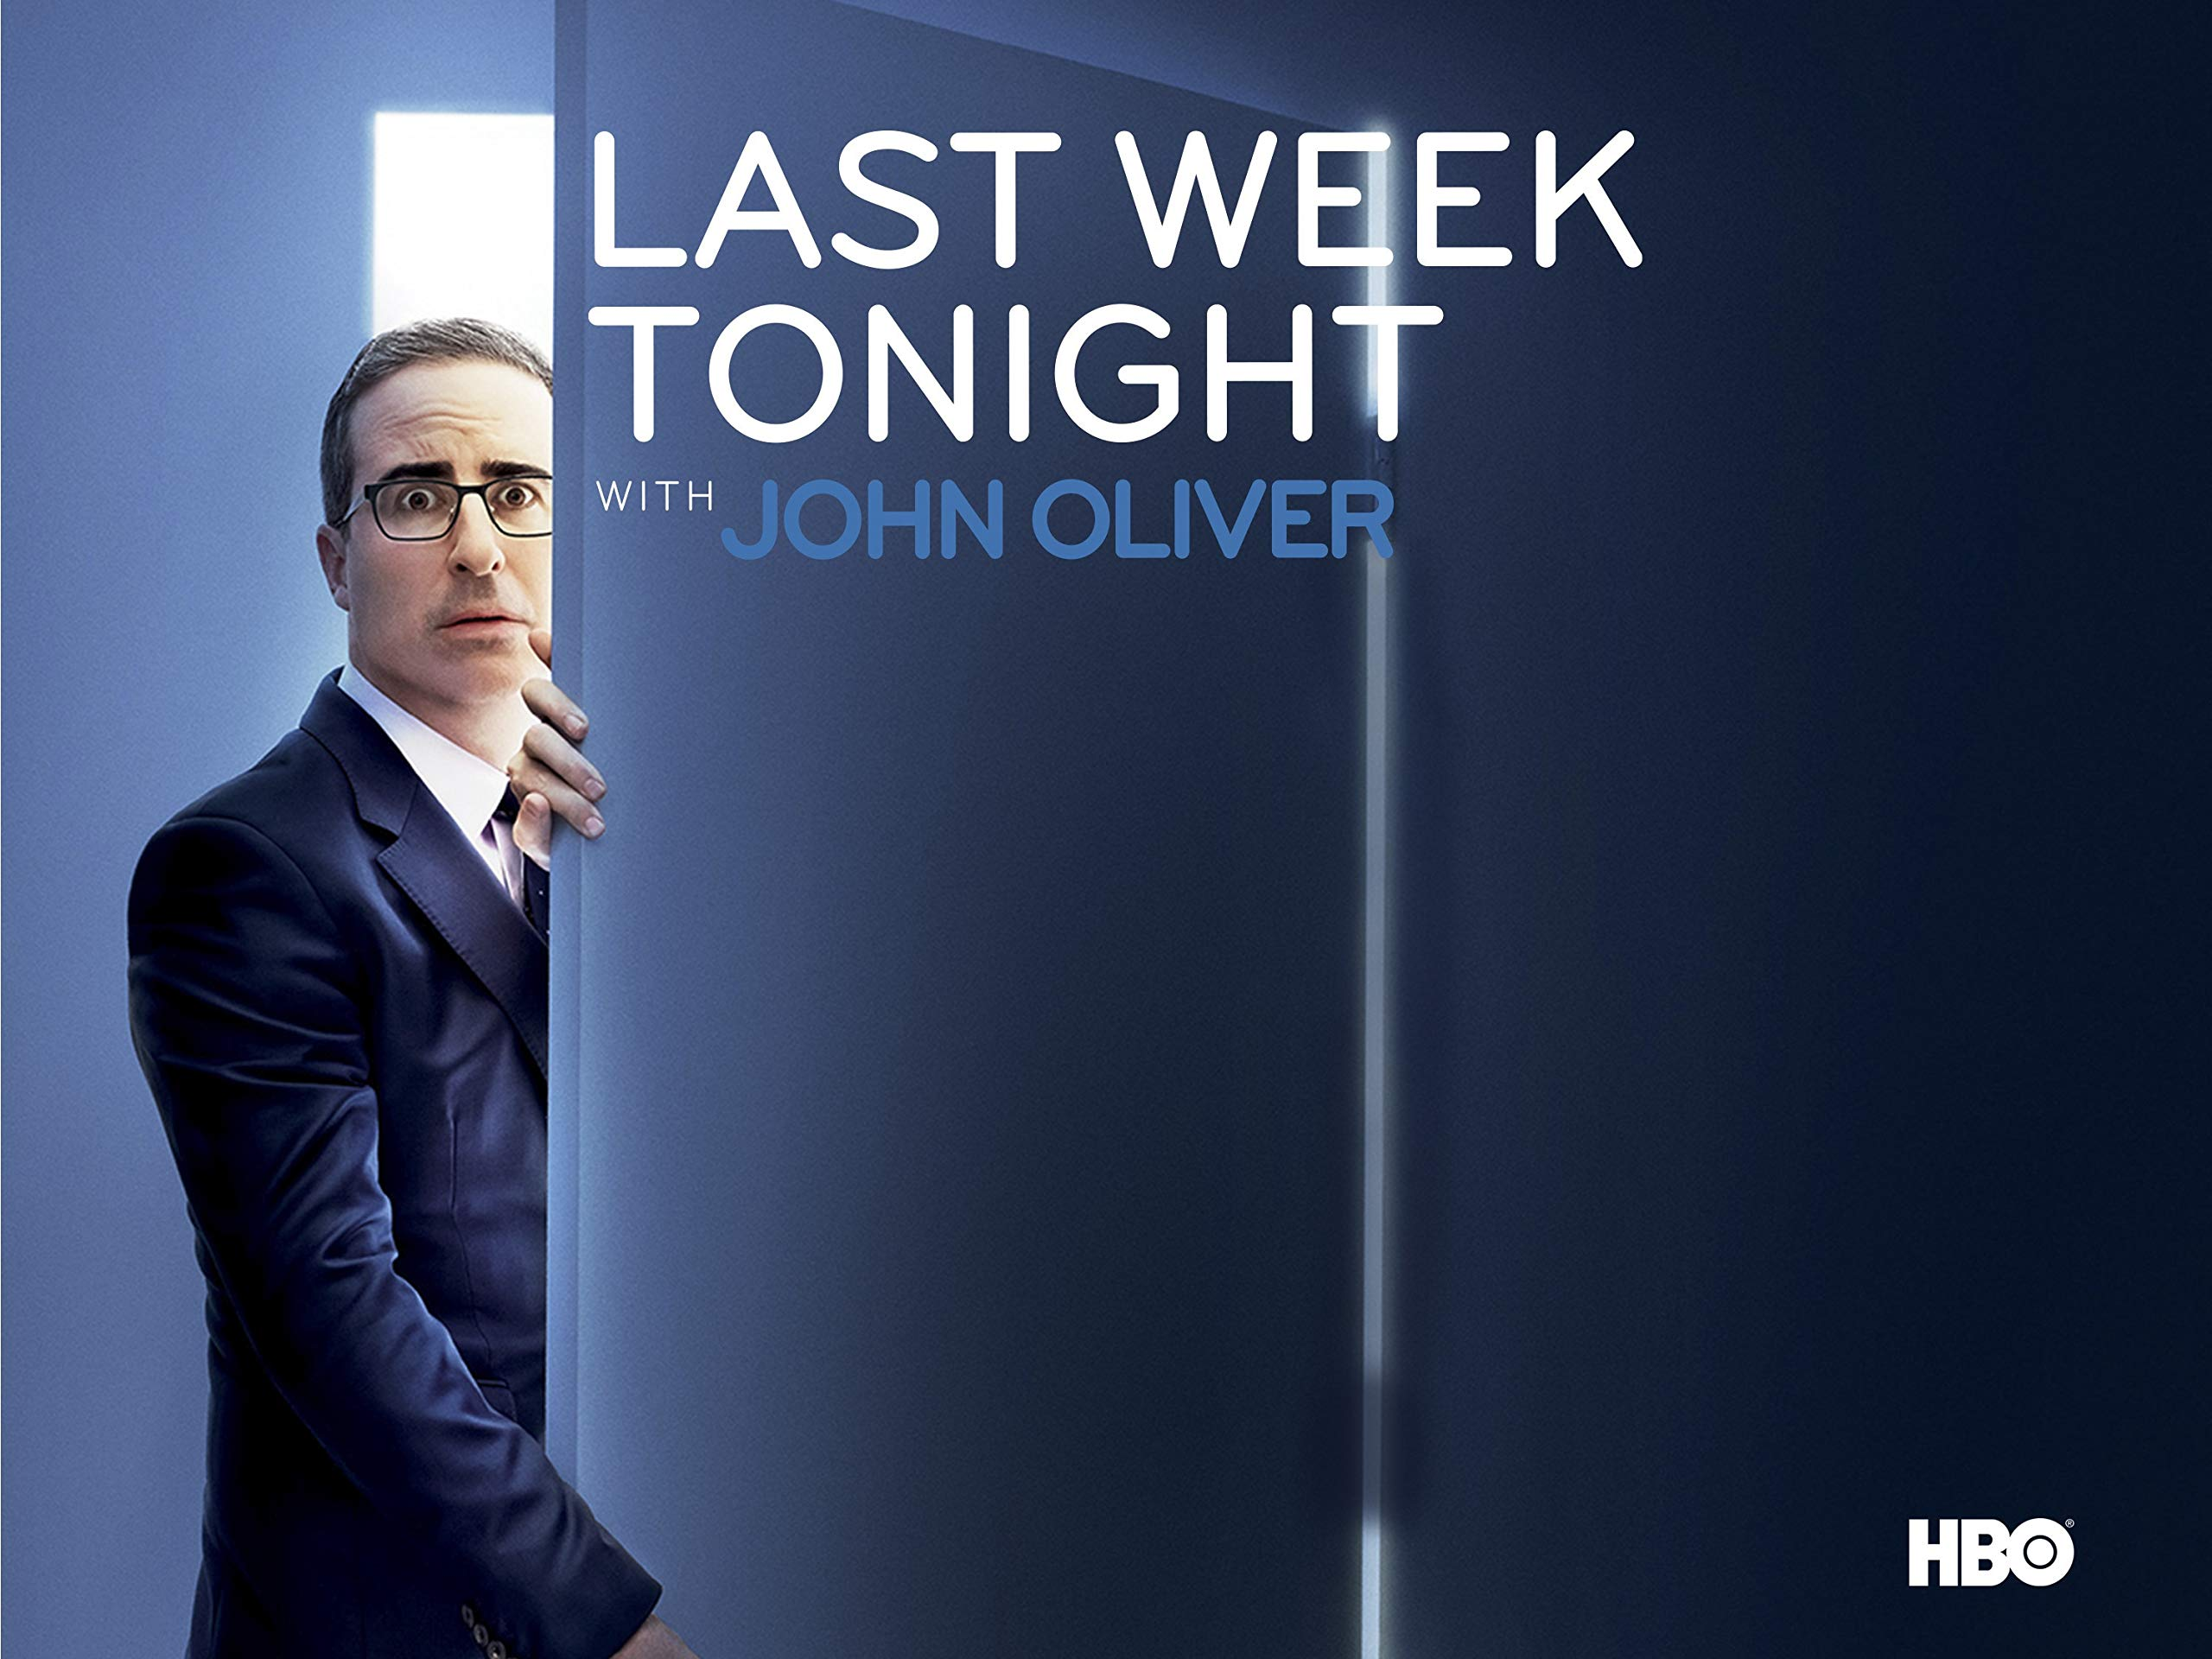 Last Week Tonight With John Oliver: Season 8 FullEpisodes Watch Online Free